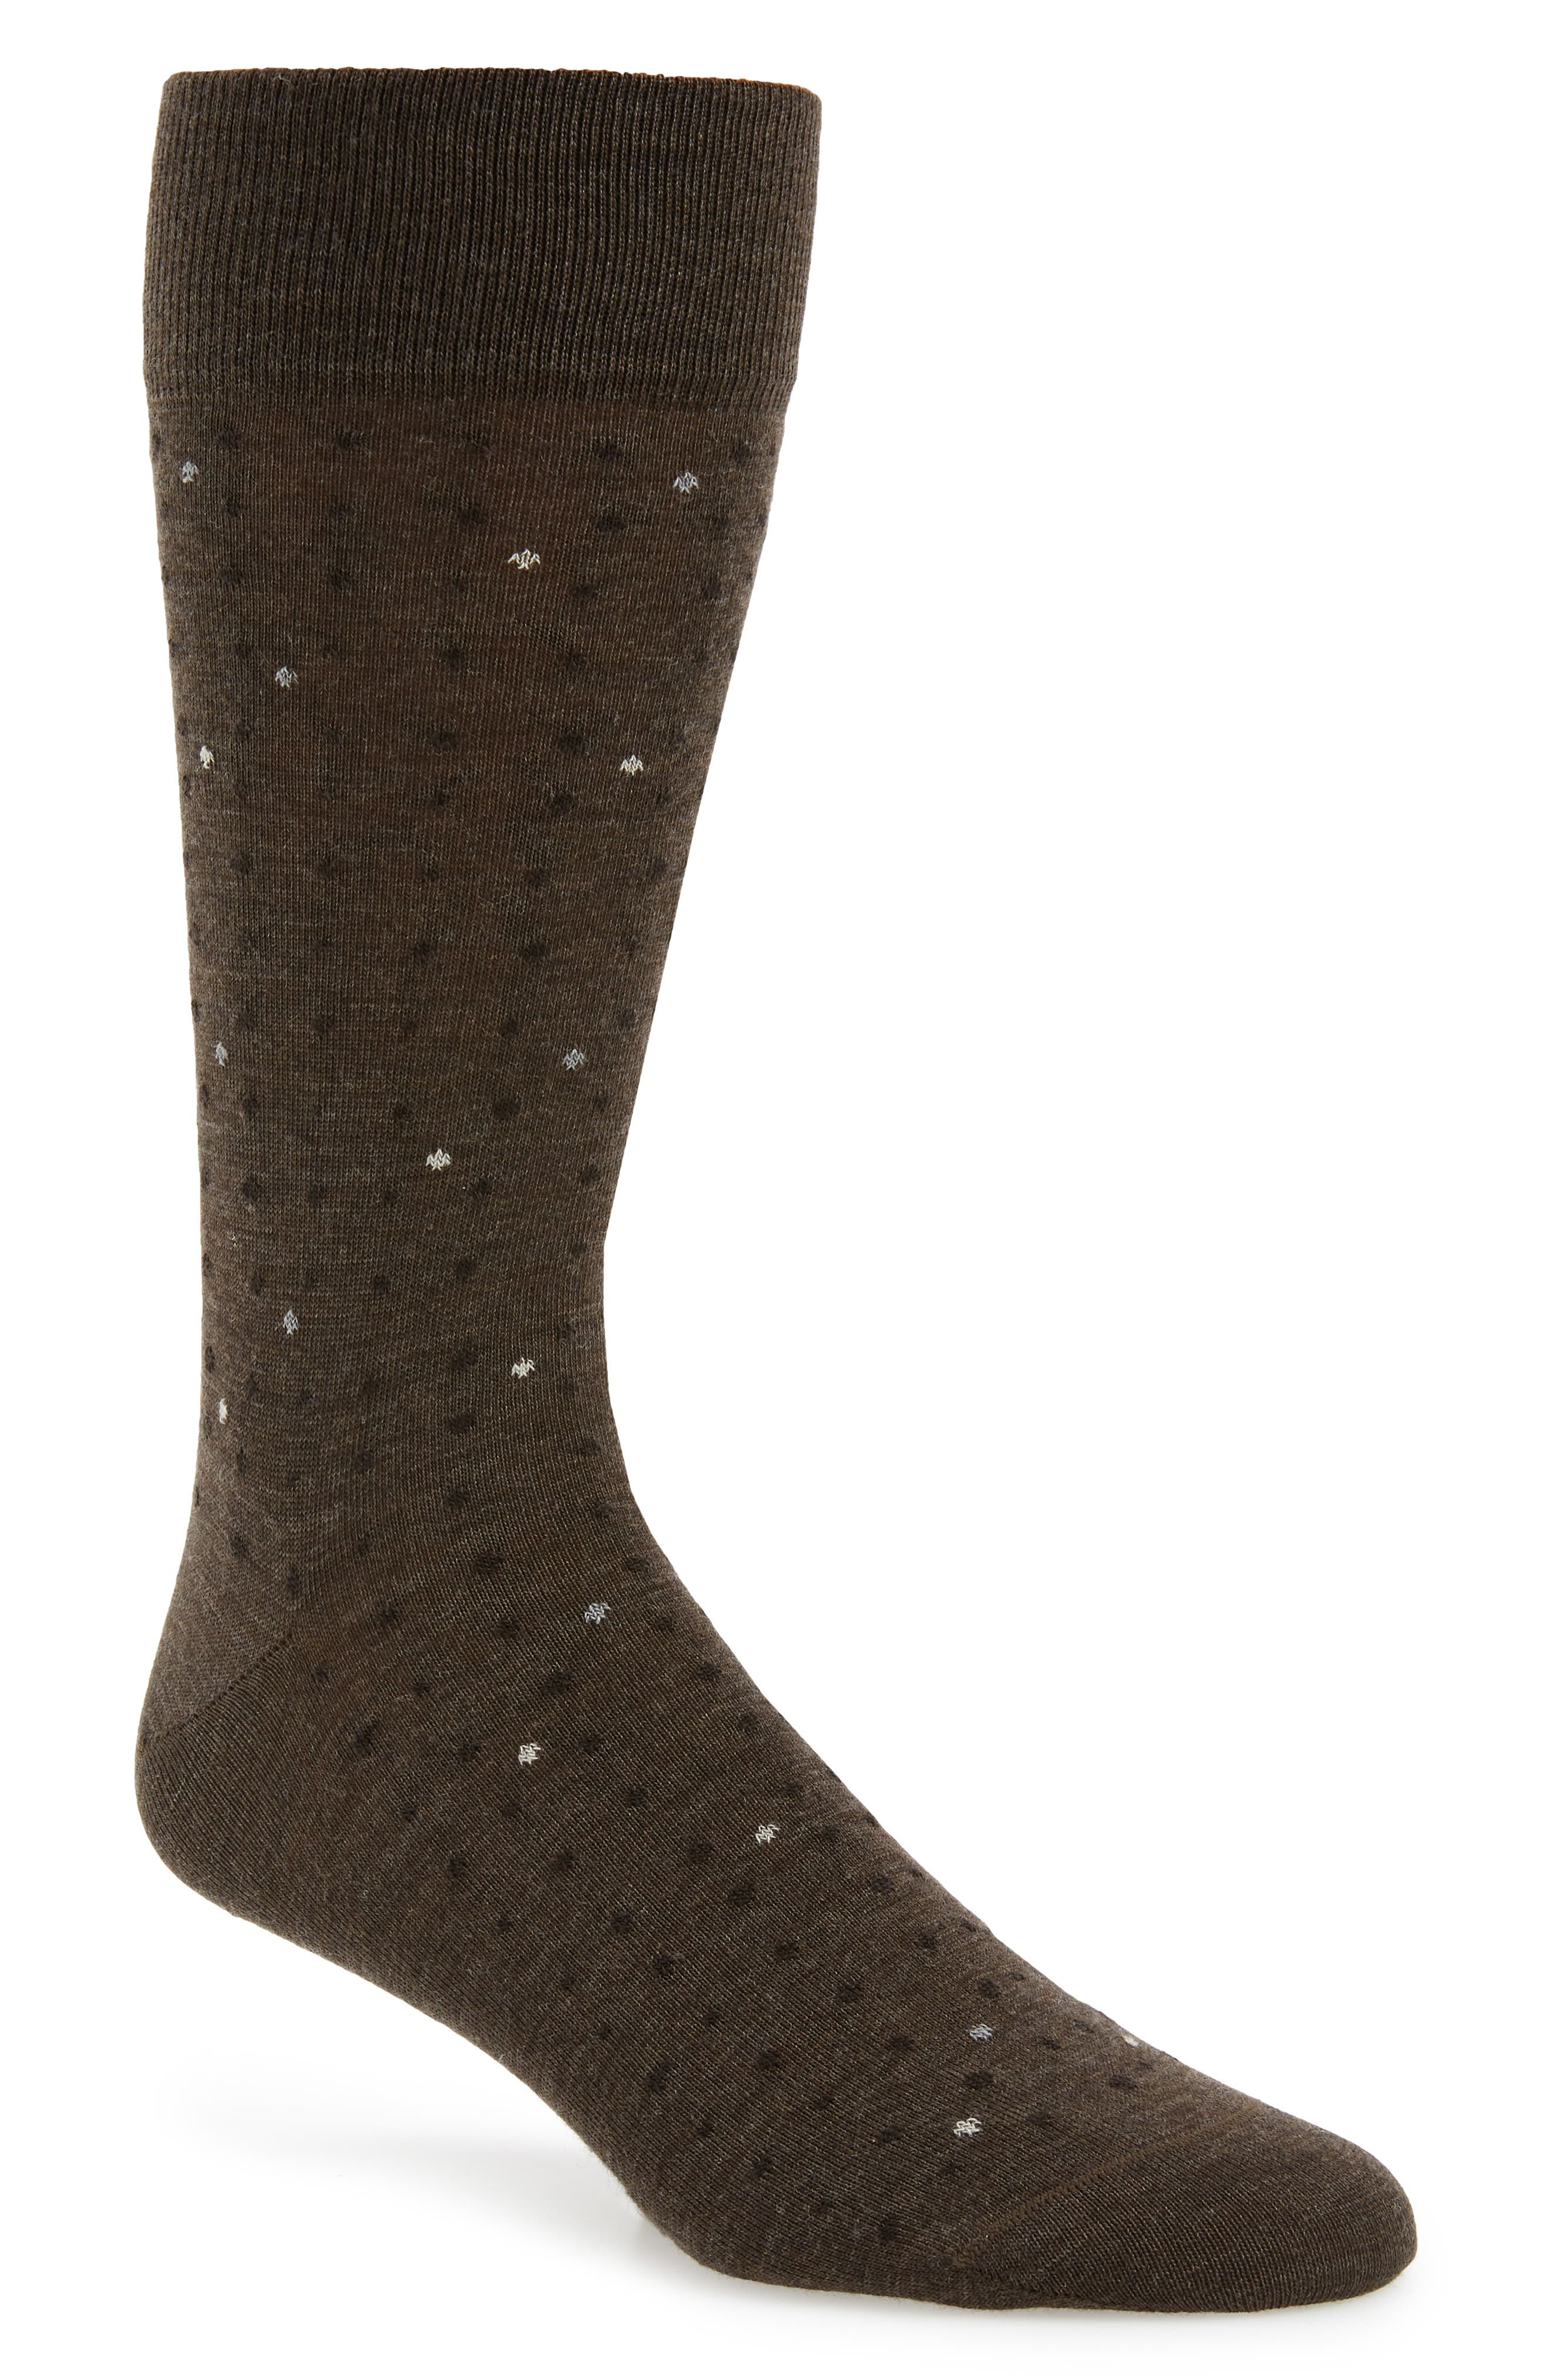 Scattered Points Socks,                         Main,                         color, 210